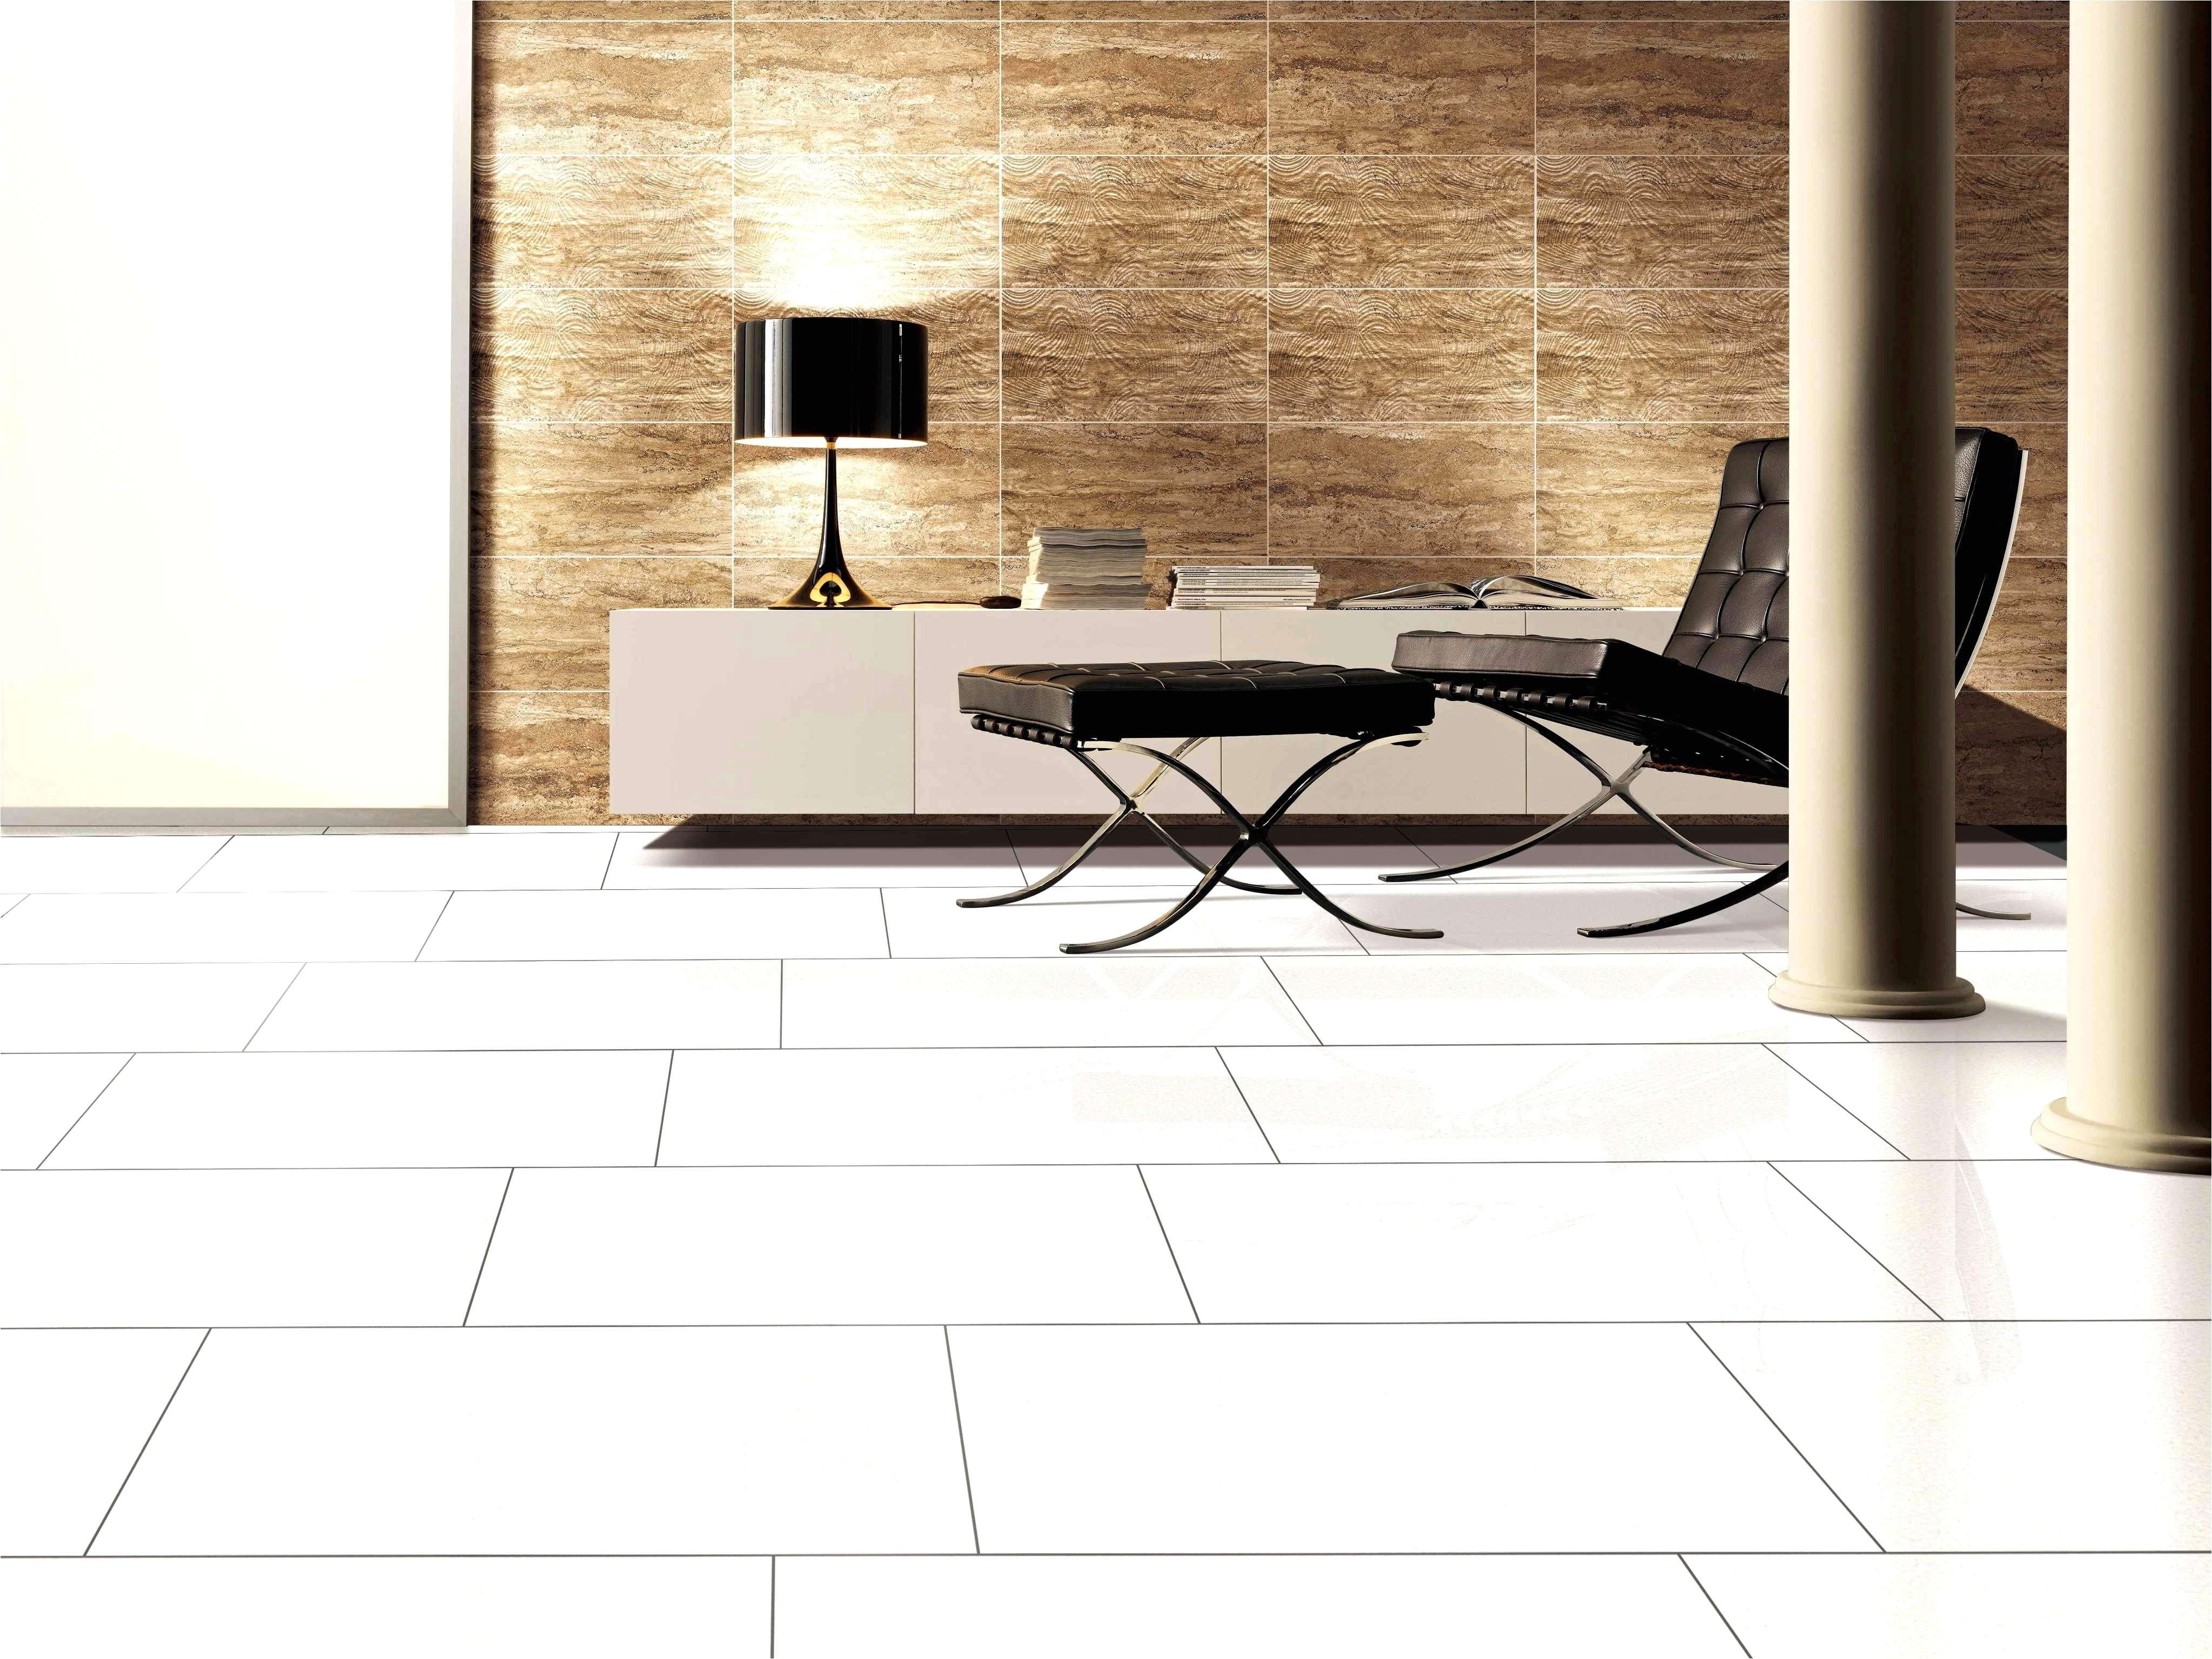 Bathroom Floor Tiles Design Refrence Unique Shower Floor Tile Ideas New Tile Floor Mosaic Bathroom 0d New